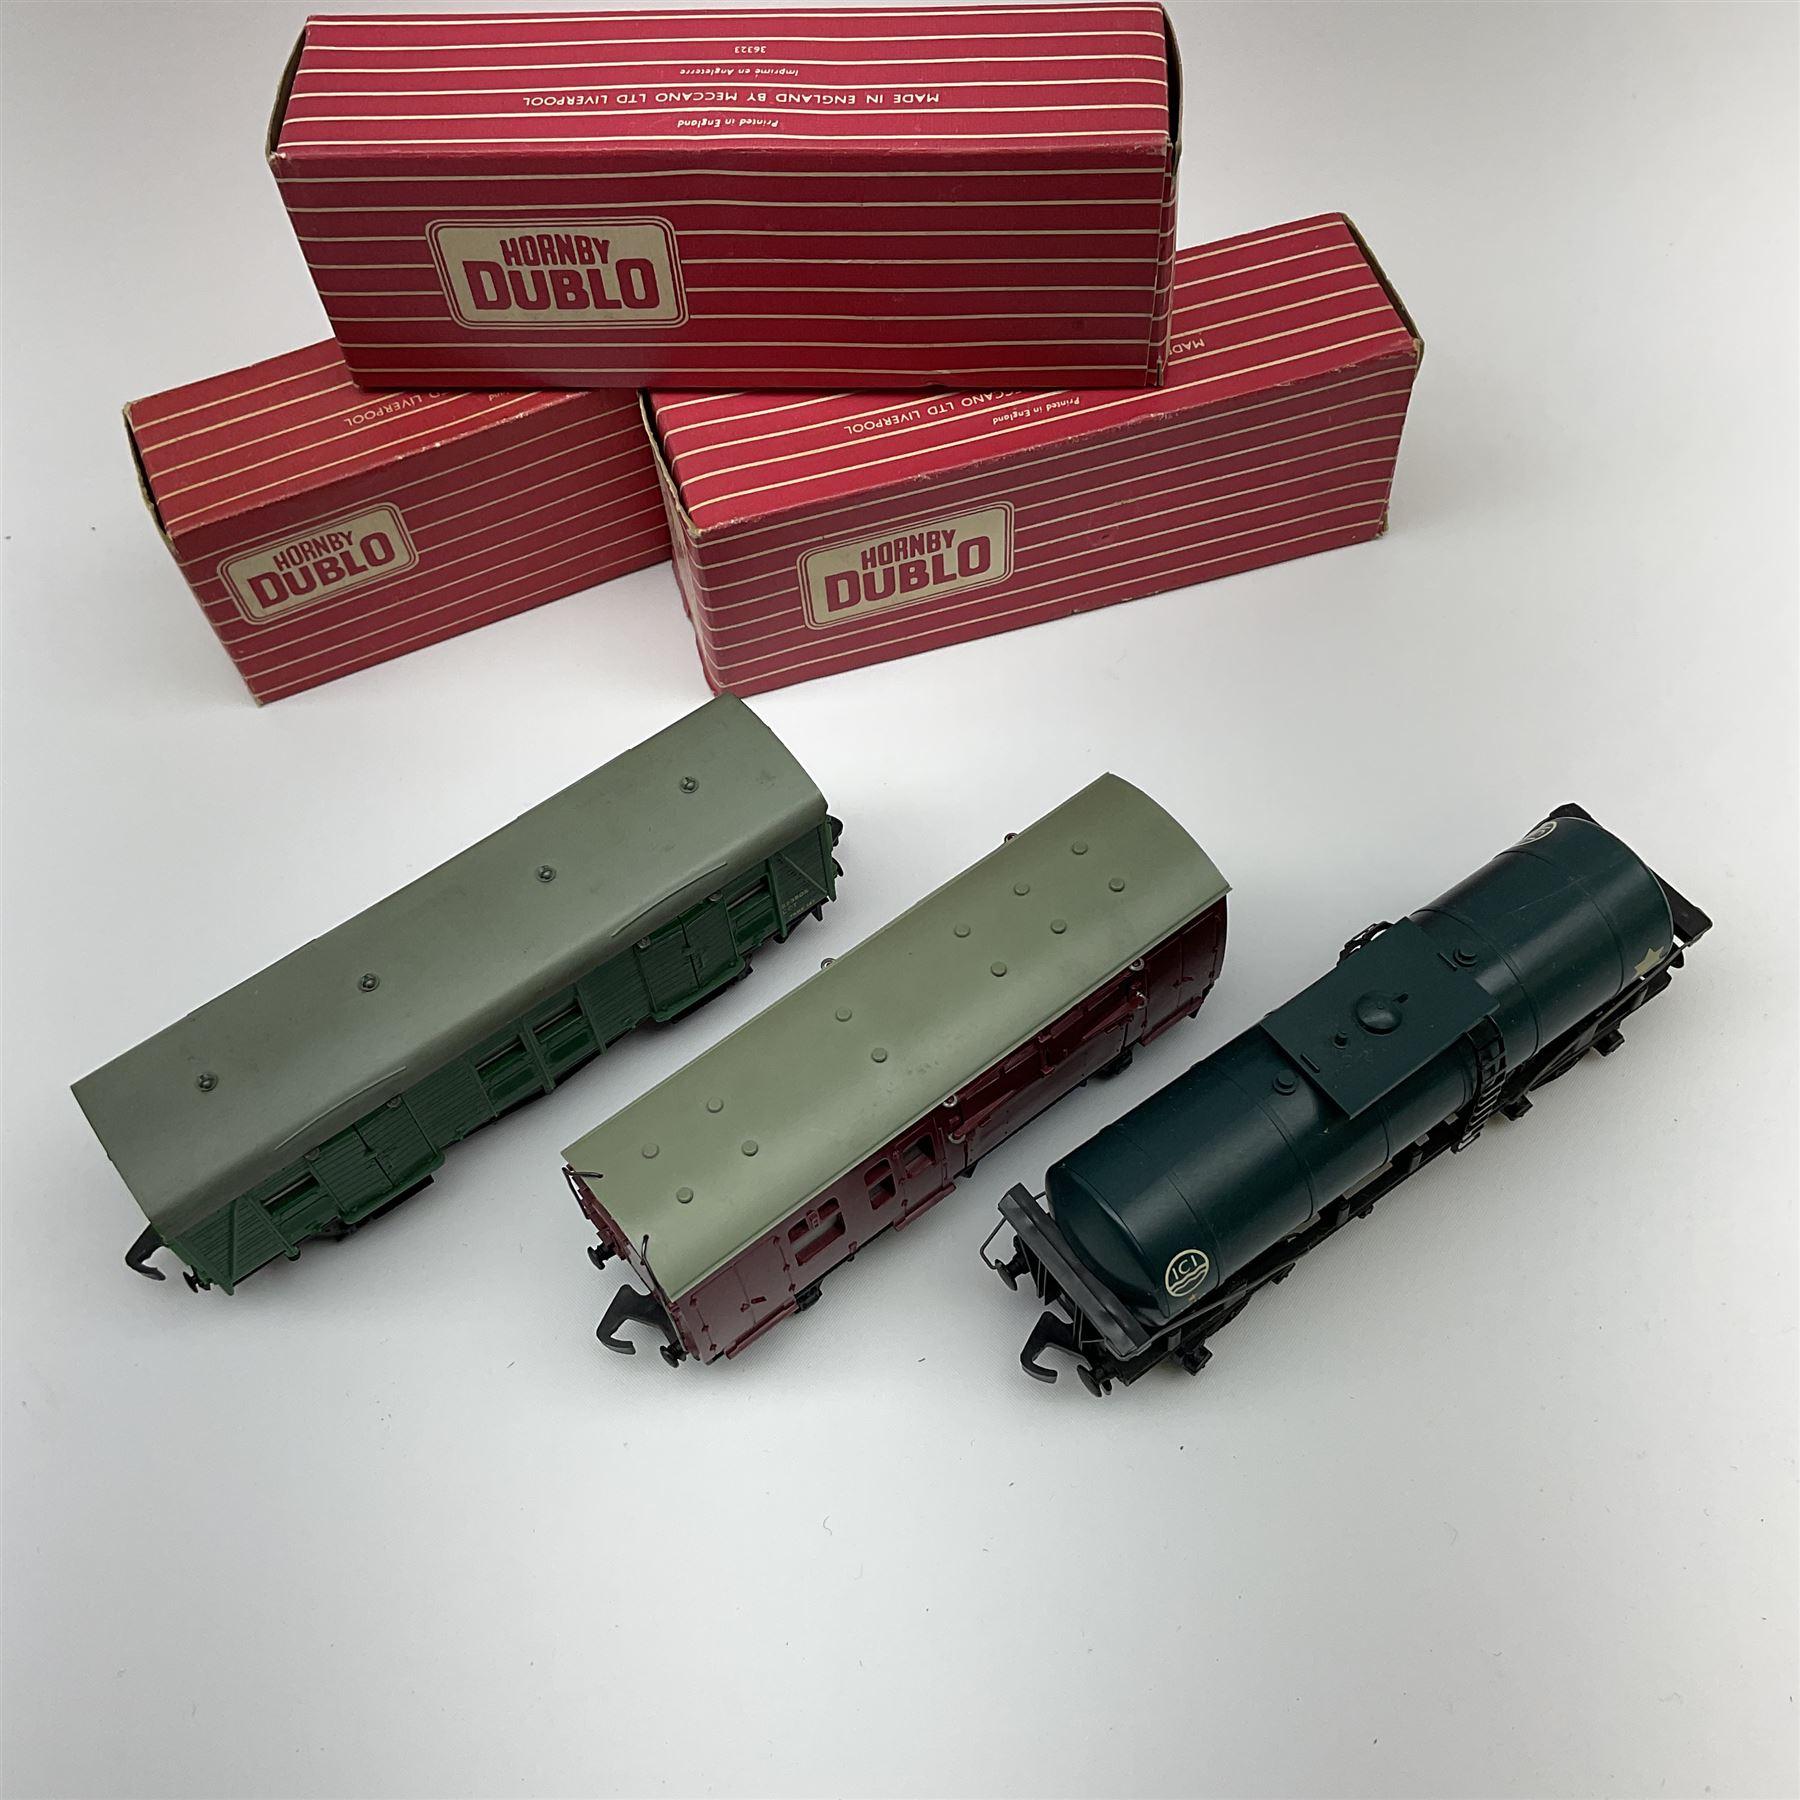 Hornby Dublo - 4685 Caustic Liquor Bogie Wagon; 4315 Horse Box with horse; and 4323 S.R. 4-Wheeled U - Image 2 of 3